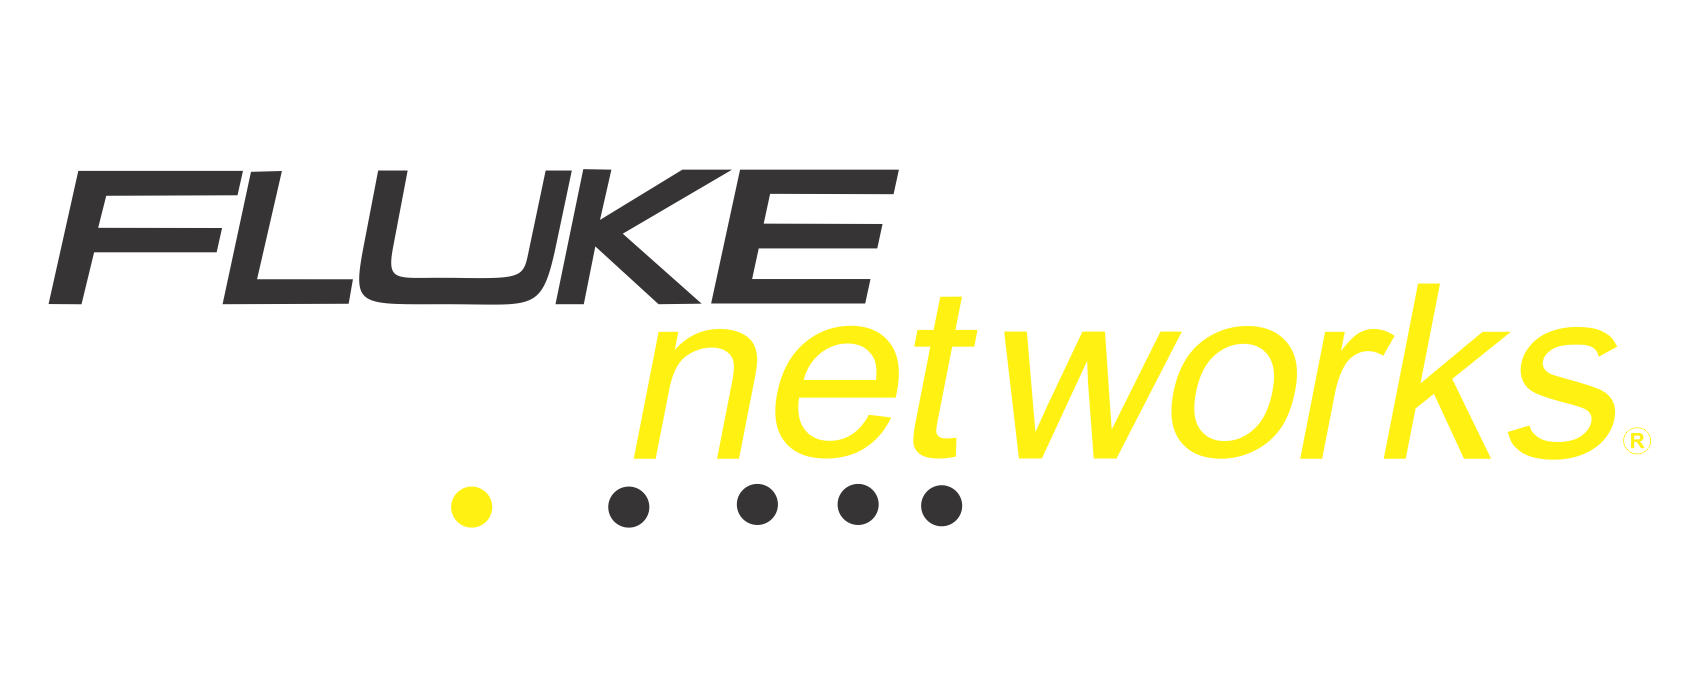 fluke-logo-ban